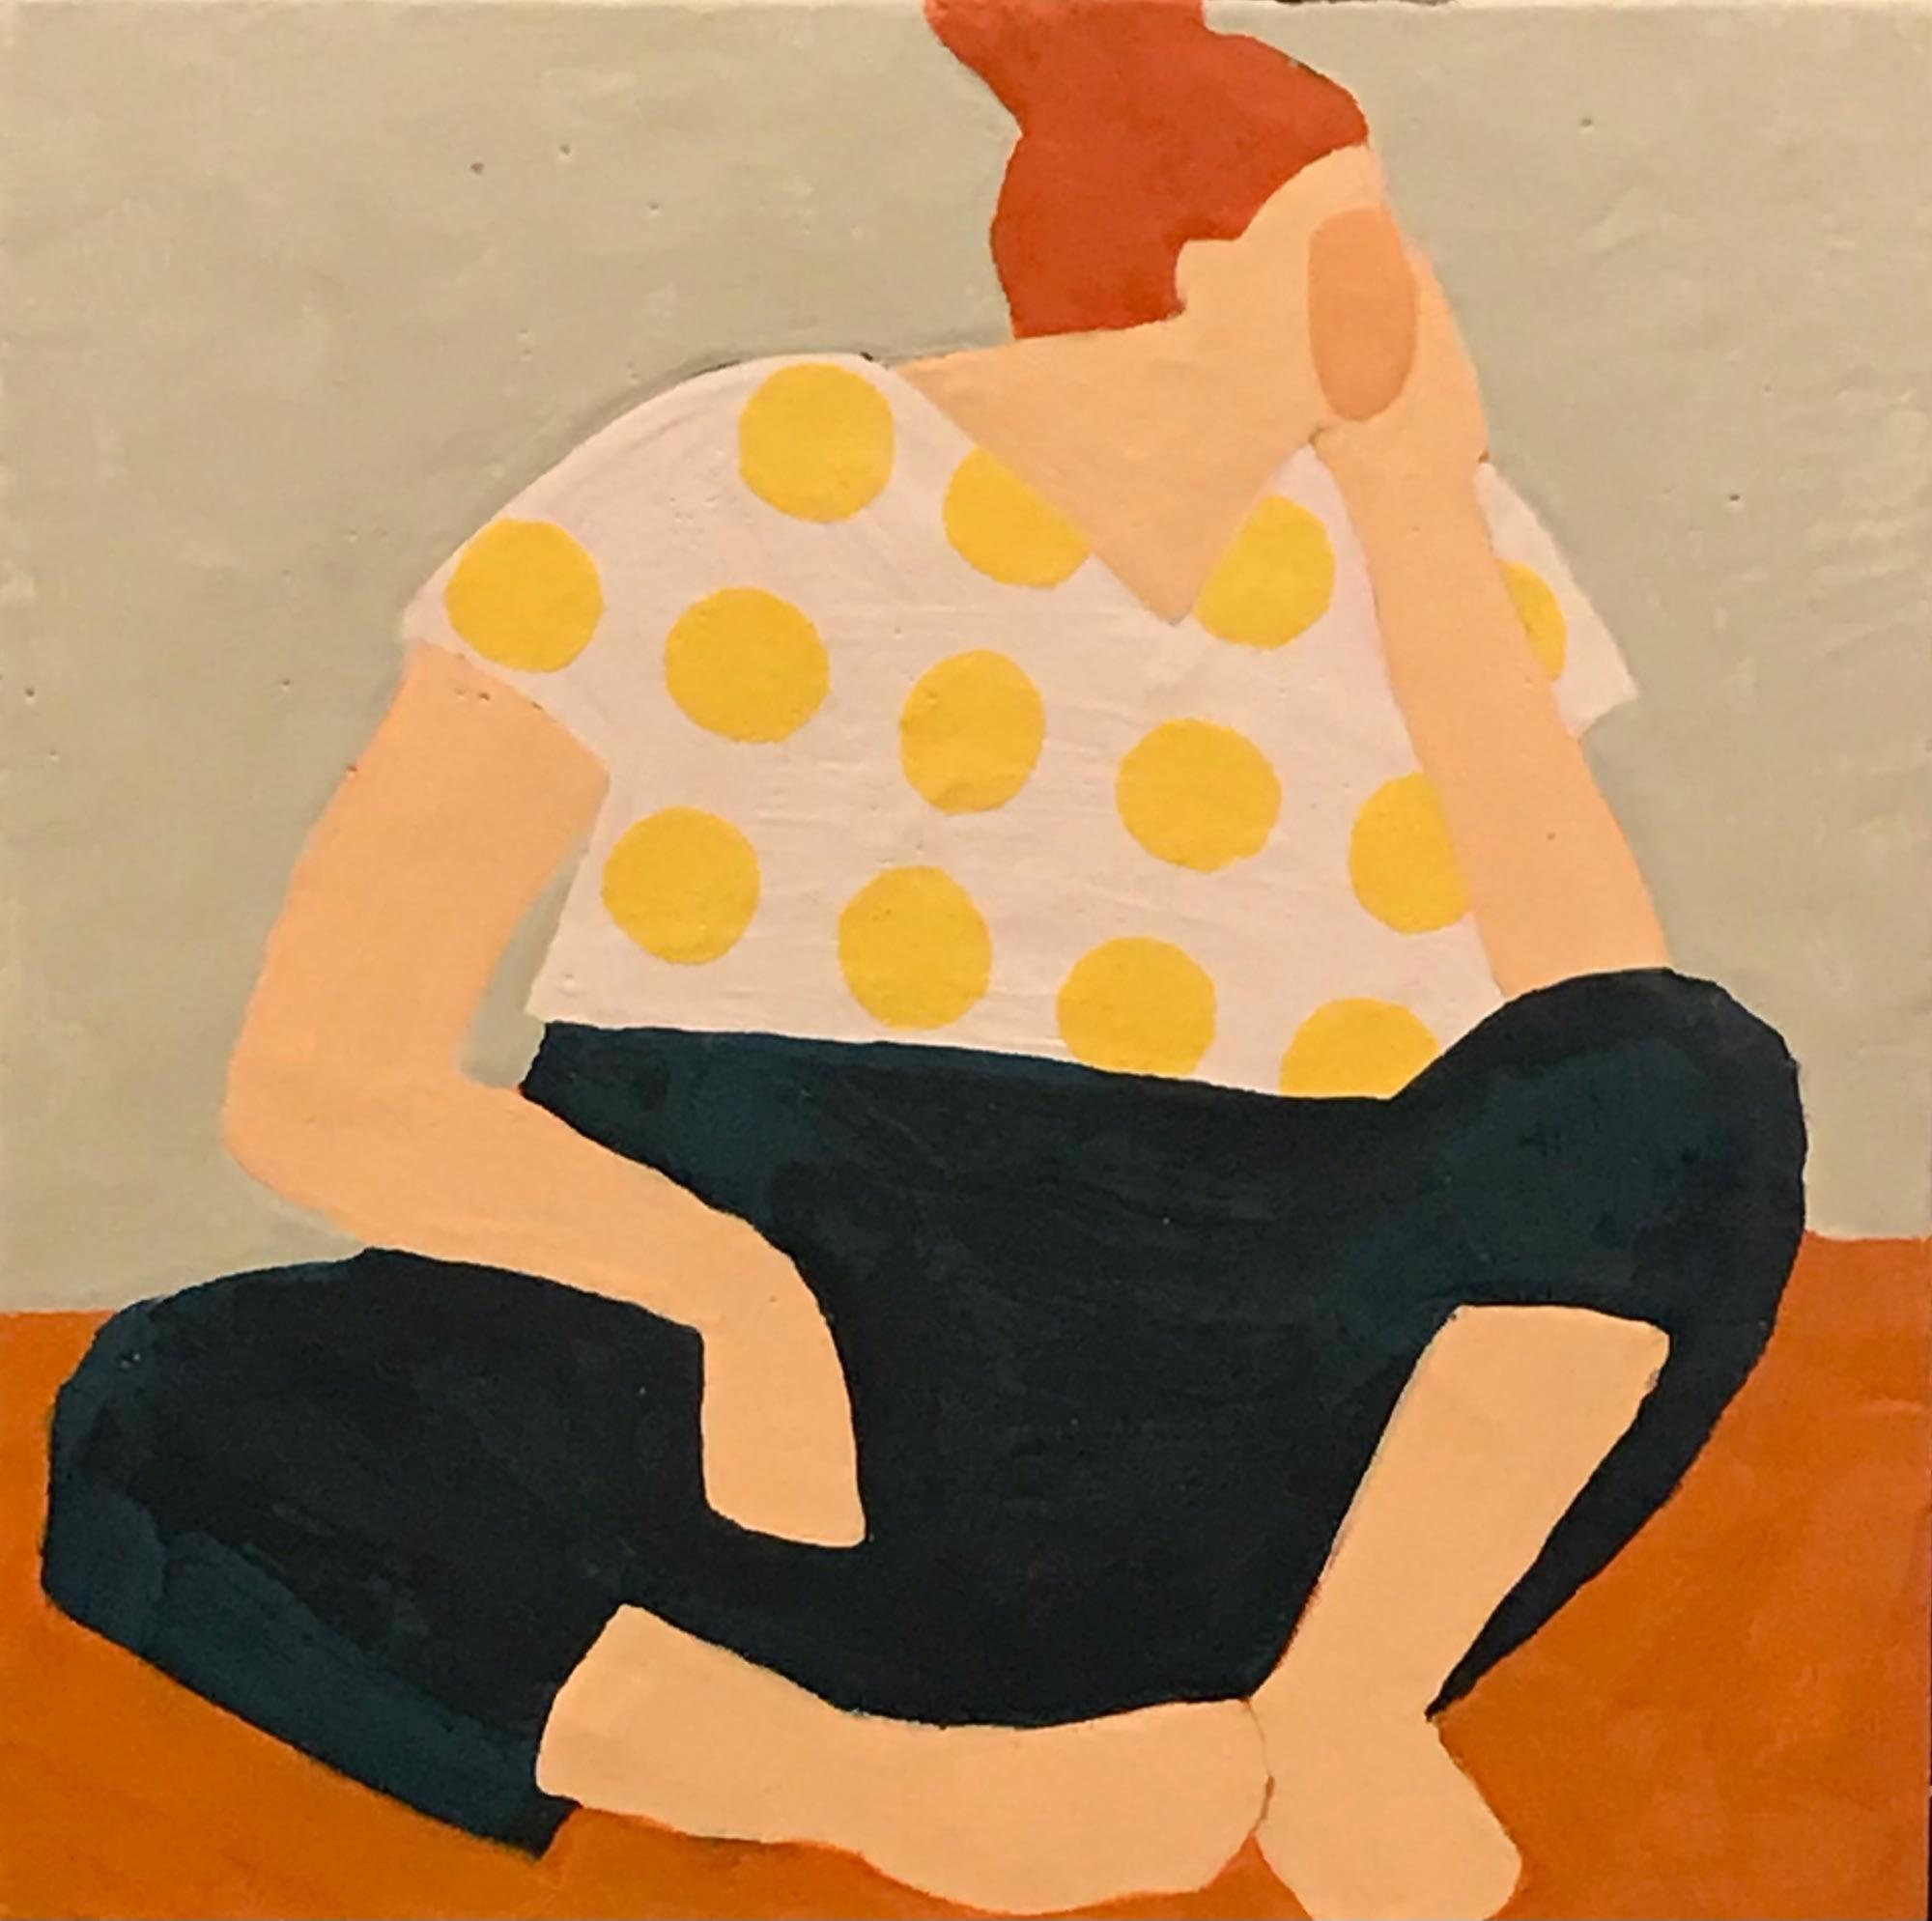 'Active Listener' by Deborah Eyde at Gallery 133